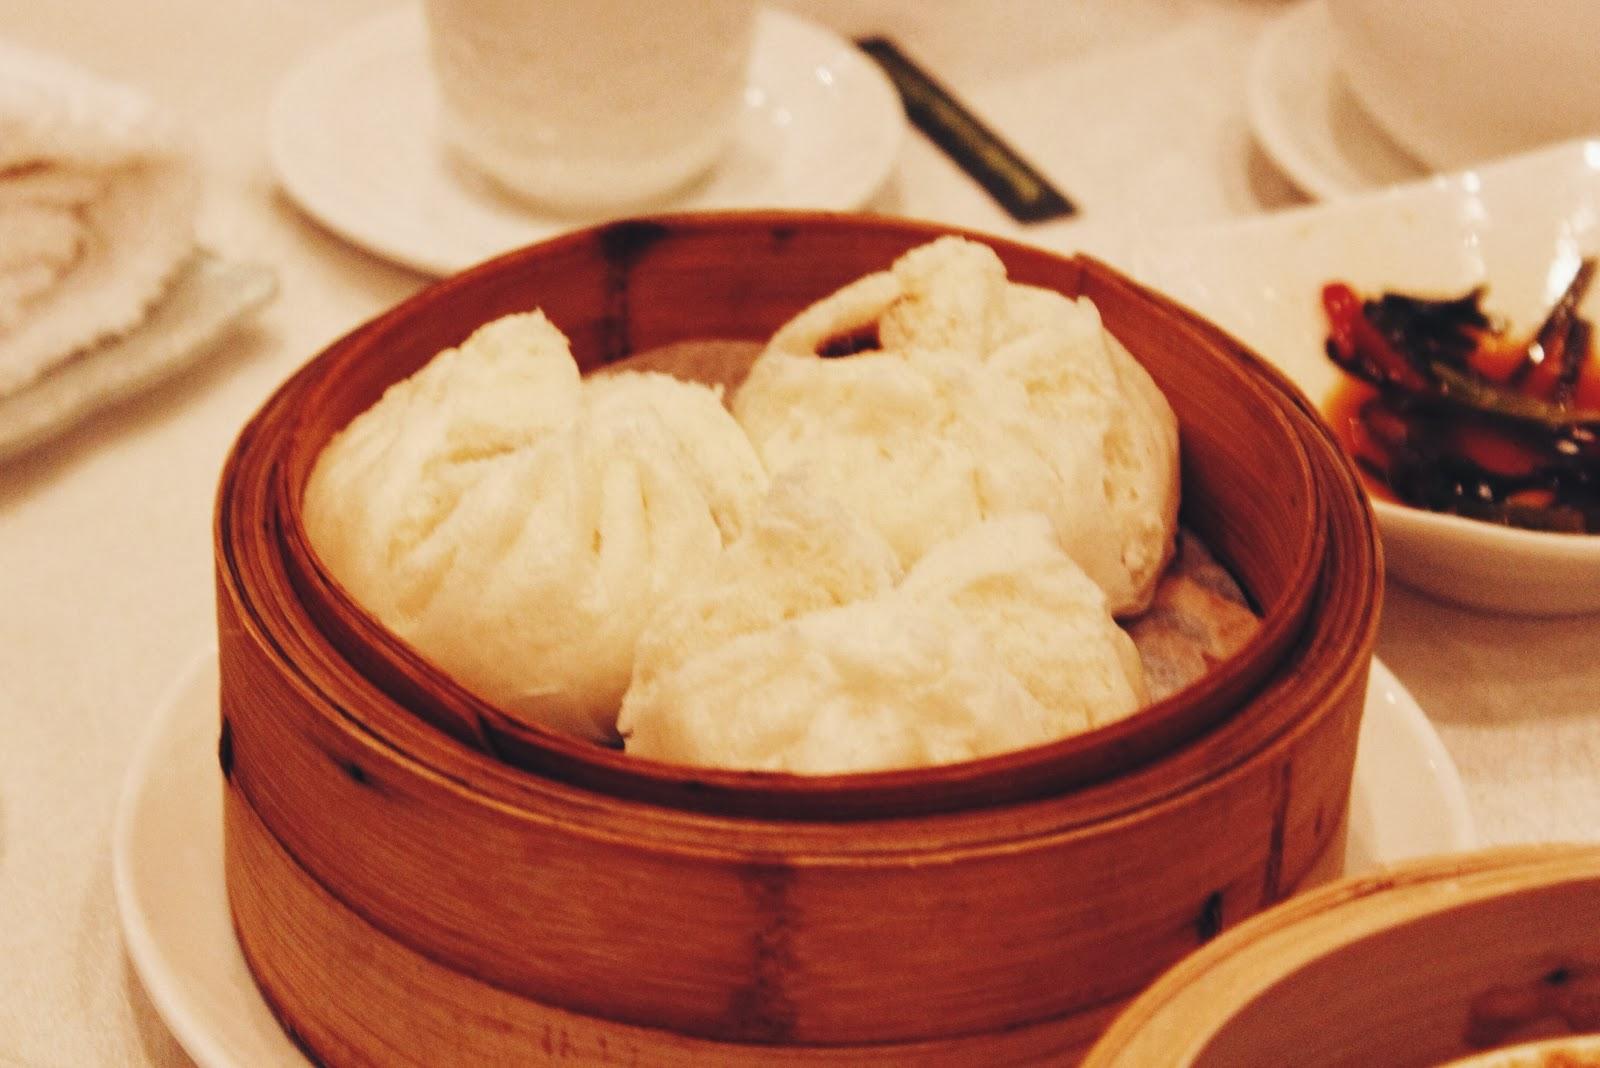 陶源酒家 Sportful Garden Restaurant @ 中国广东深圳罗湖金光华广场 Kingglory Plazza, Luohu, Shenzhen, Guangdong, China